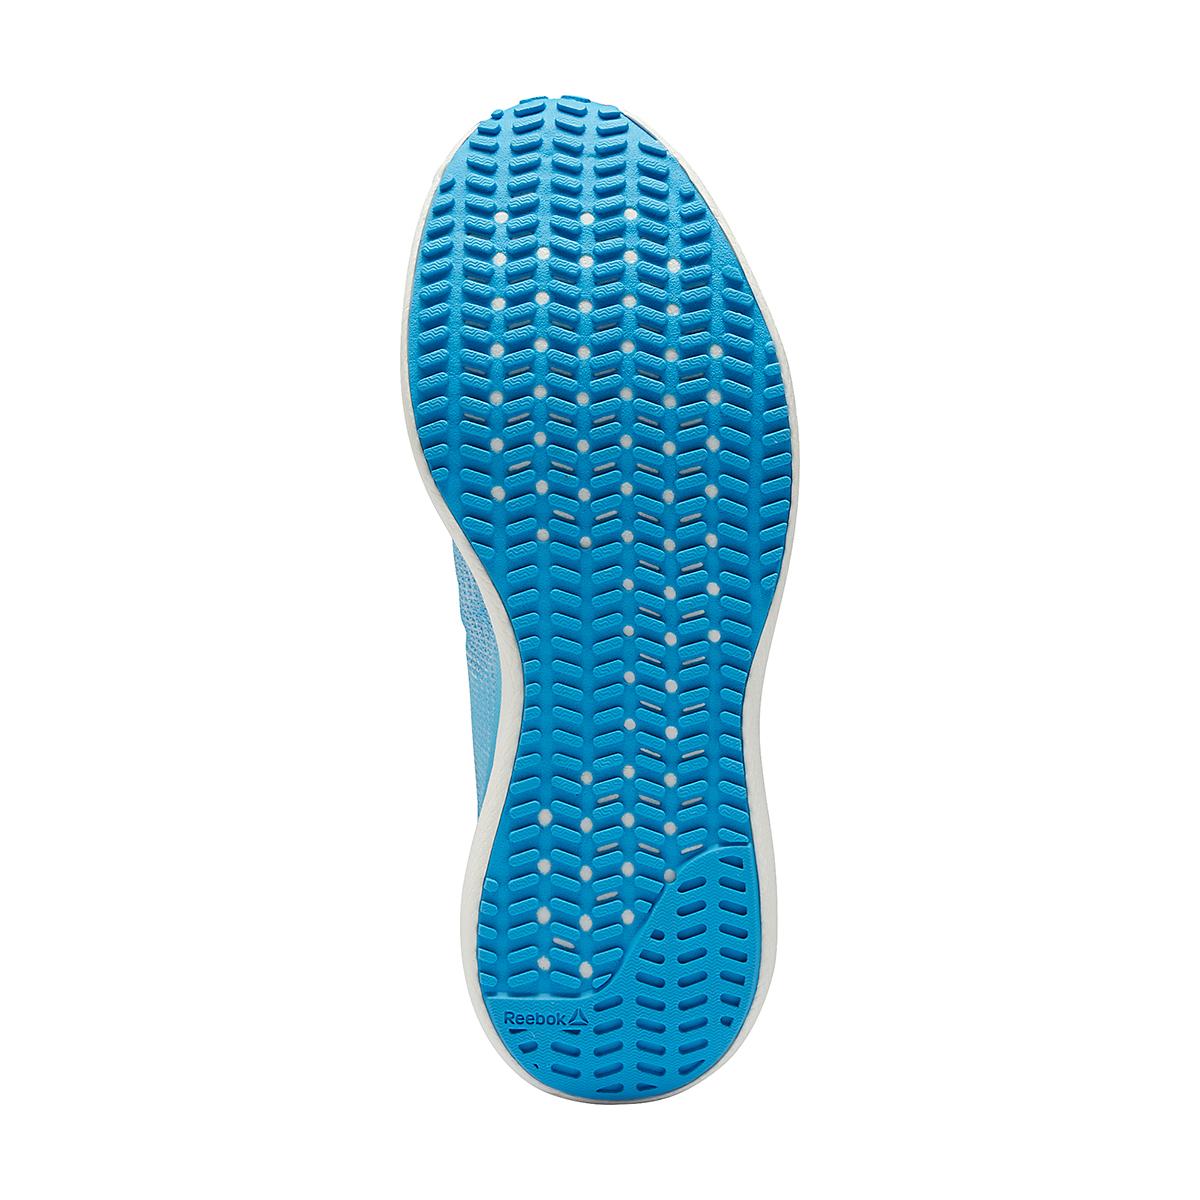 Women's Reebok Floatride Run Fast 3.0 Running Shoe - Color: Radiant Aqua /Orange Flare /White - Size: 5 - Width: Regular, Radiant Aqua /Orange Flare /White, large, image 3